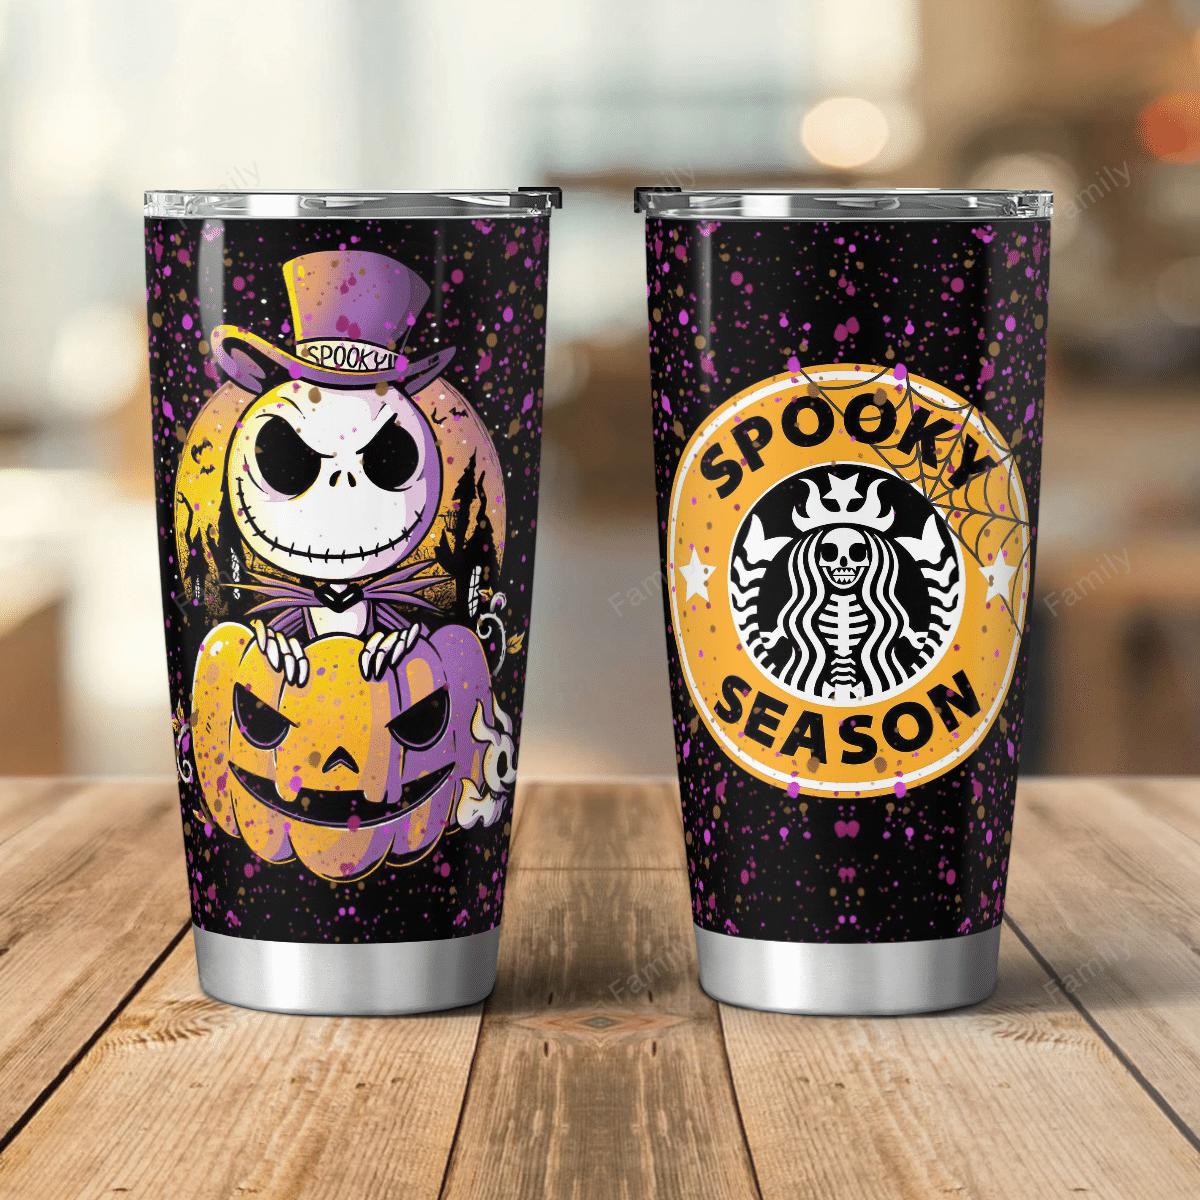 Spooky Season Skellington Pumpkin Tumbler